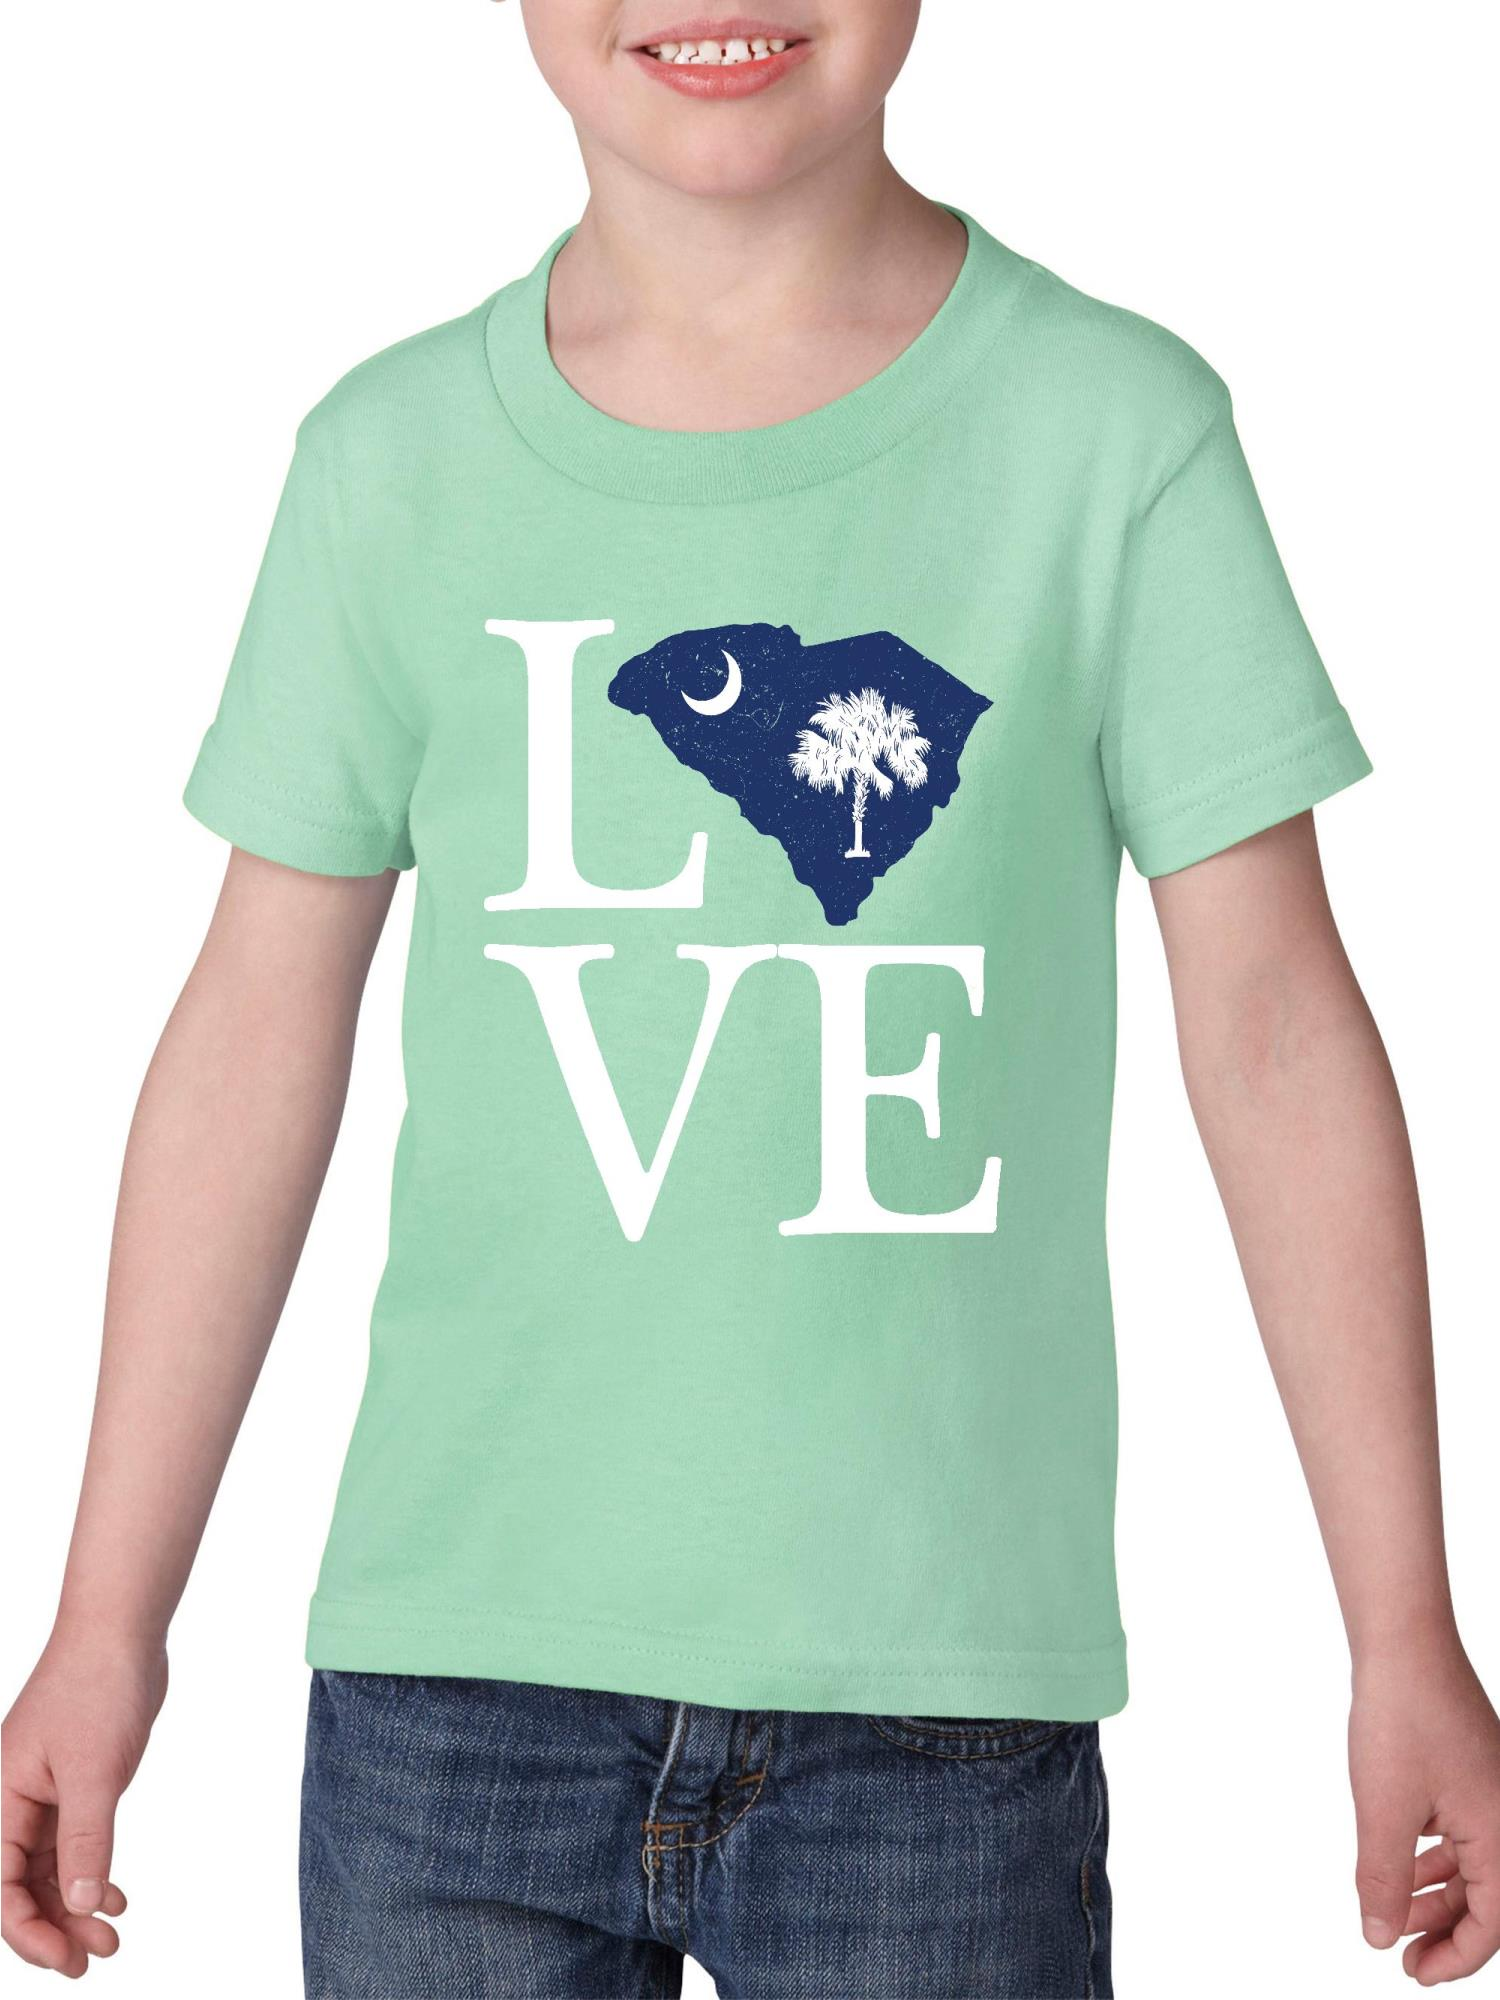 Love South Carolina Heavy Cotton Toddler Kids T-Shirt Tee Clothing